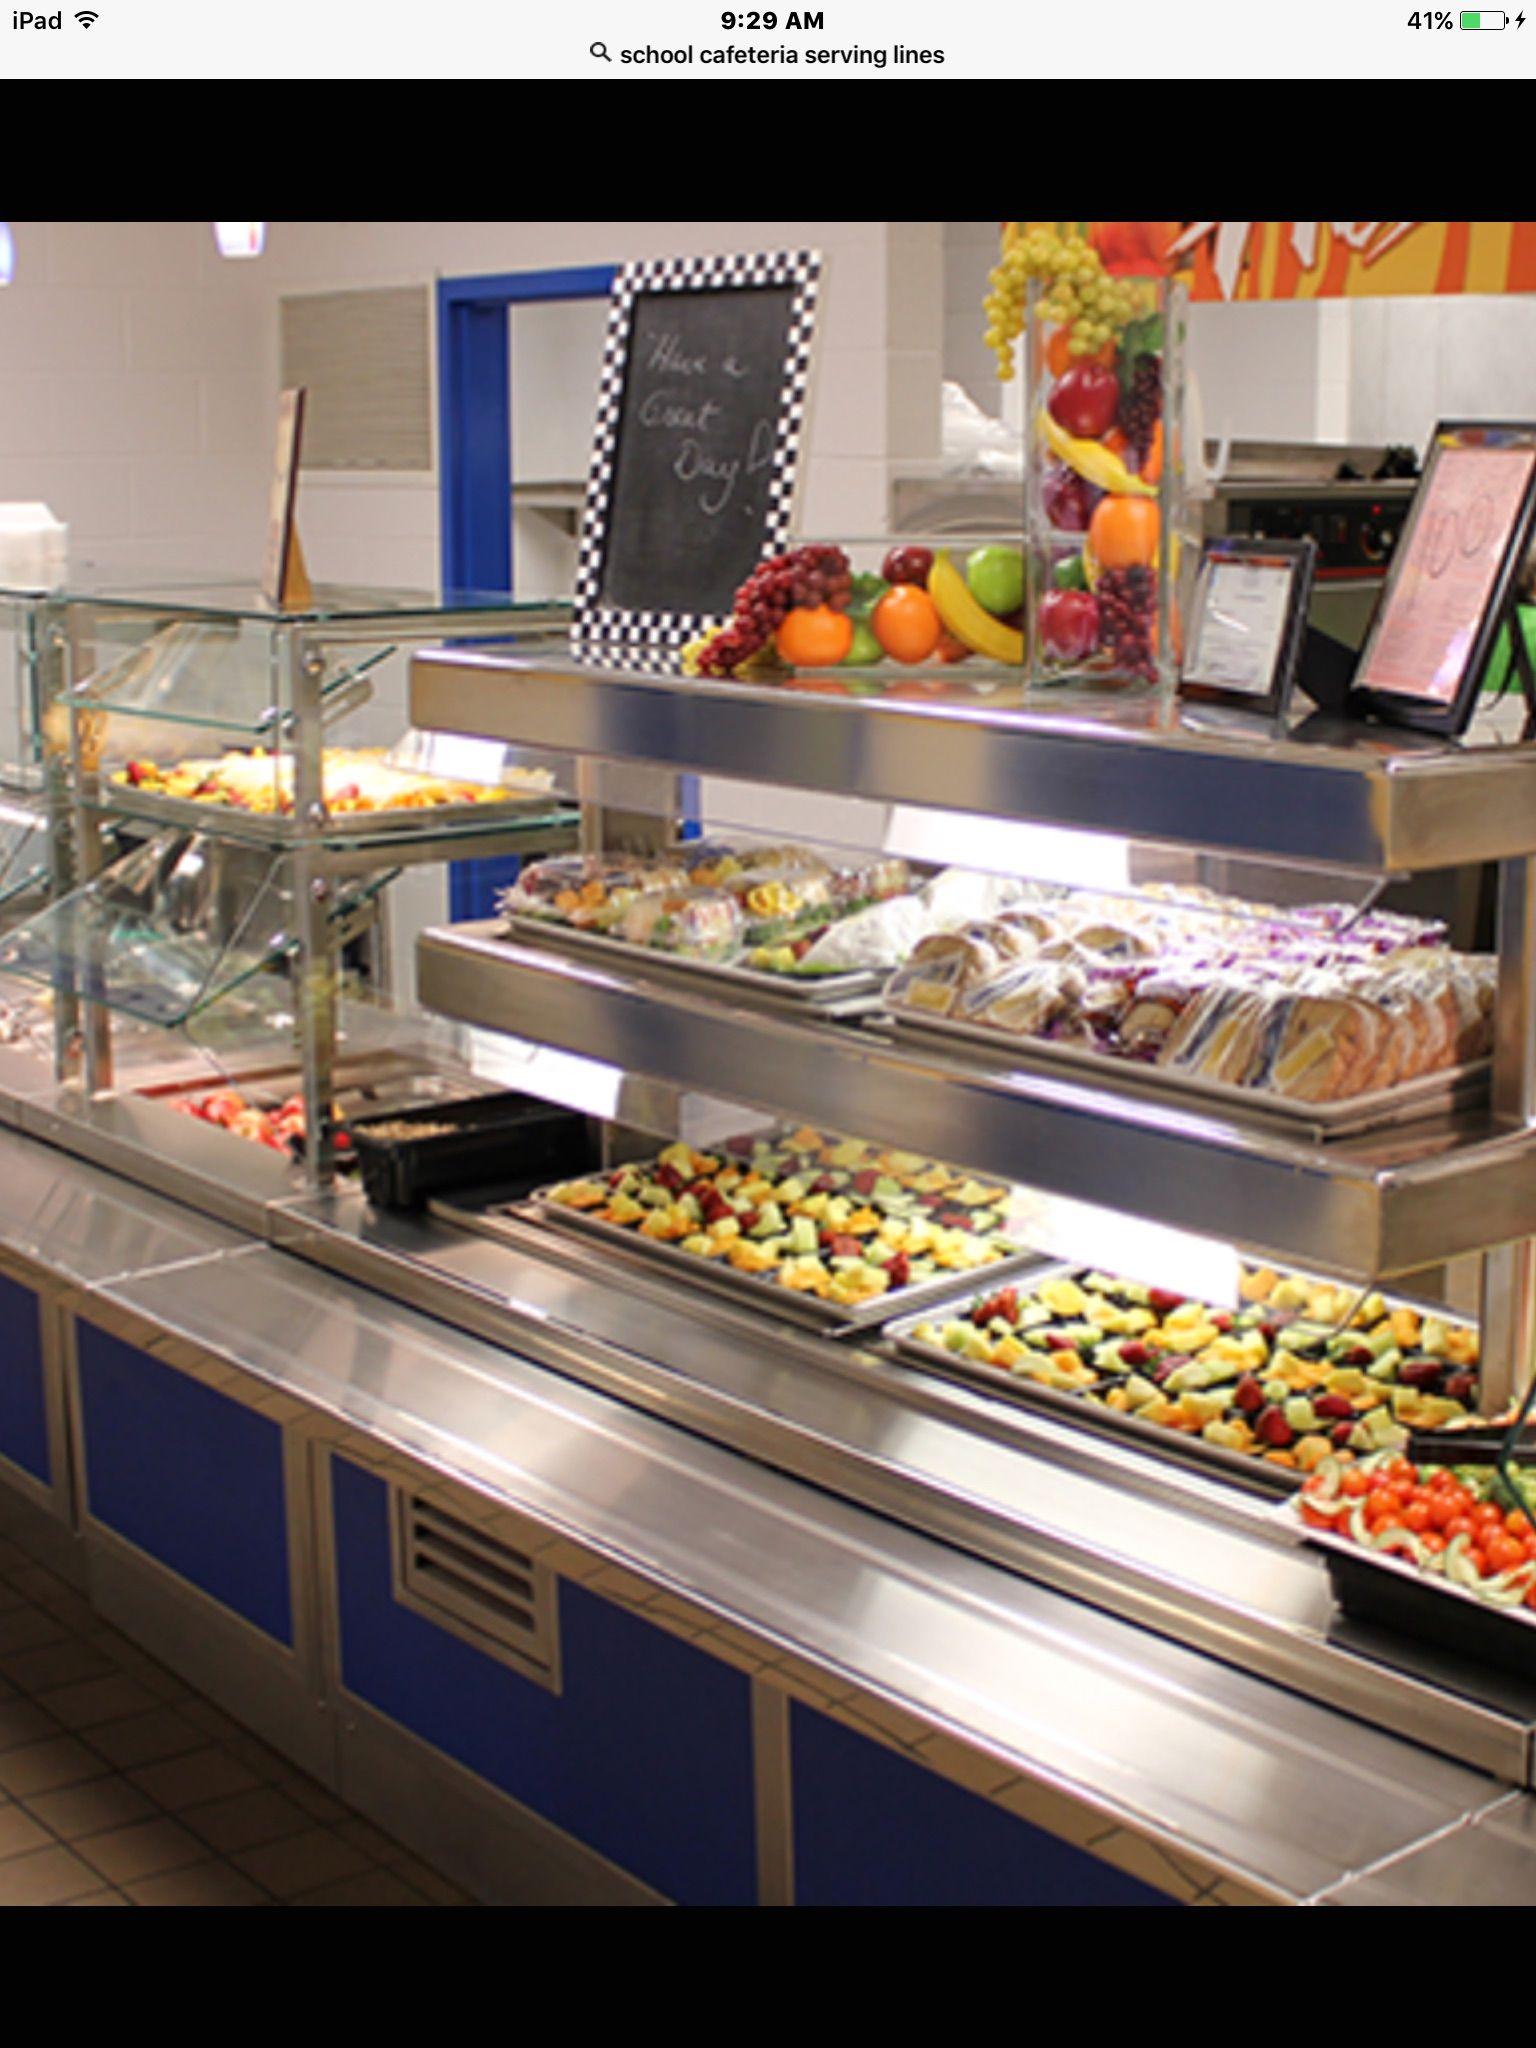 Pin by Debbi Loi on Lunchroom ideas School cafeteria